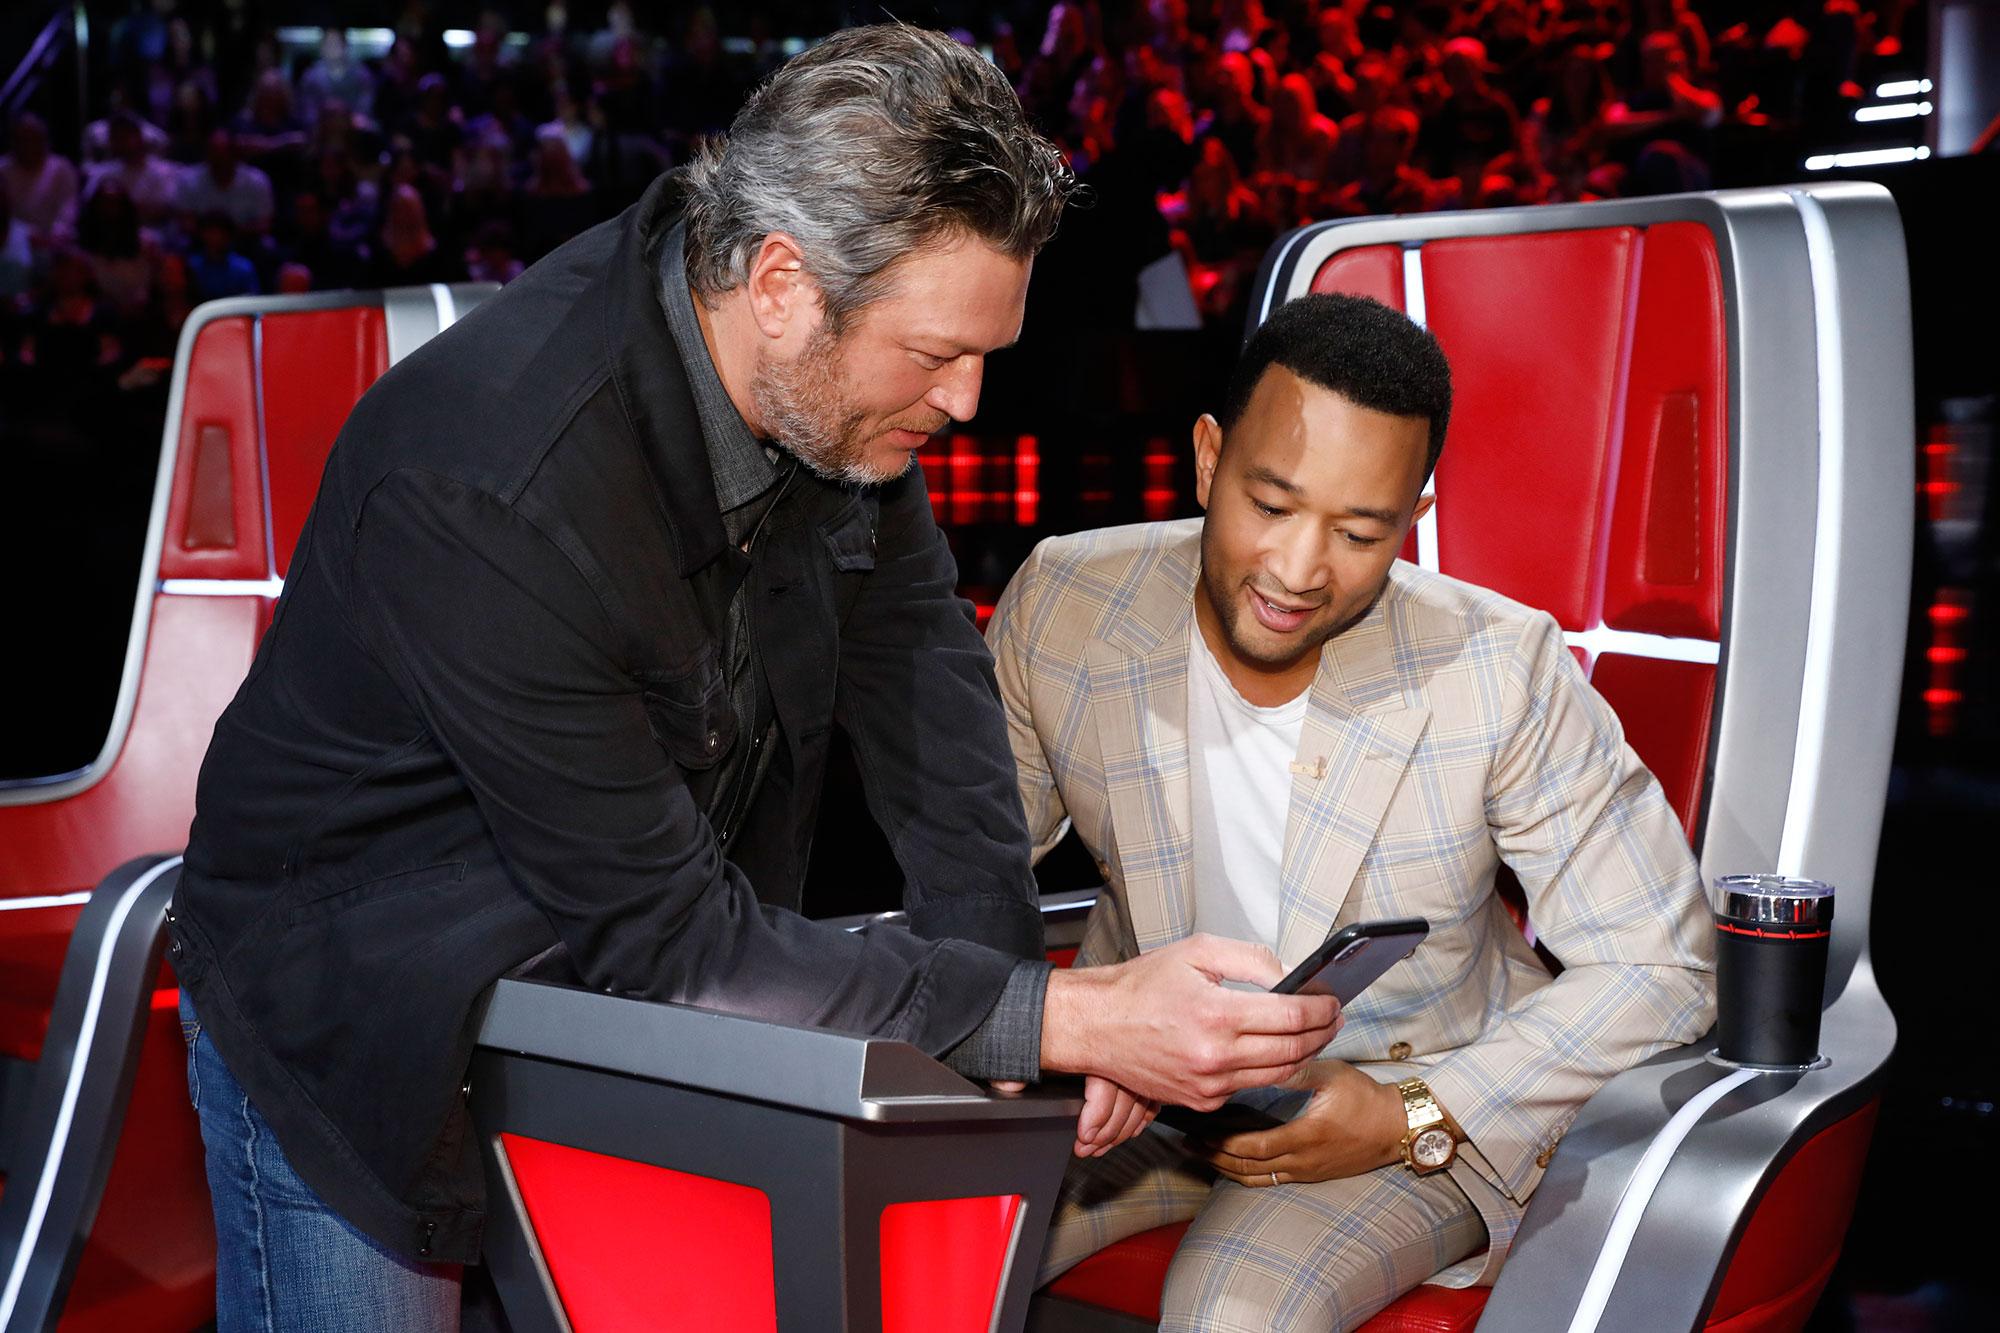 Blake Shelton, John Legend Voice Who Will Win - Blake Shelton and John Legend during an episode of 'The Voice.